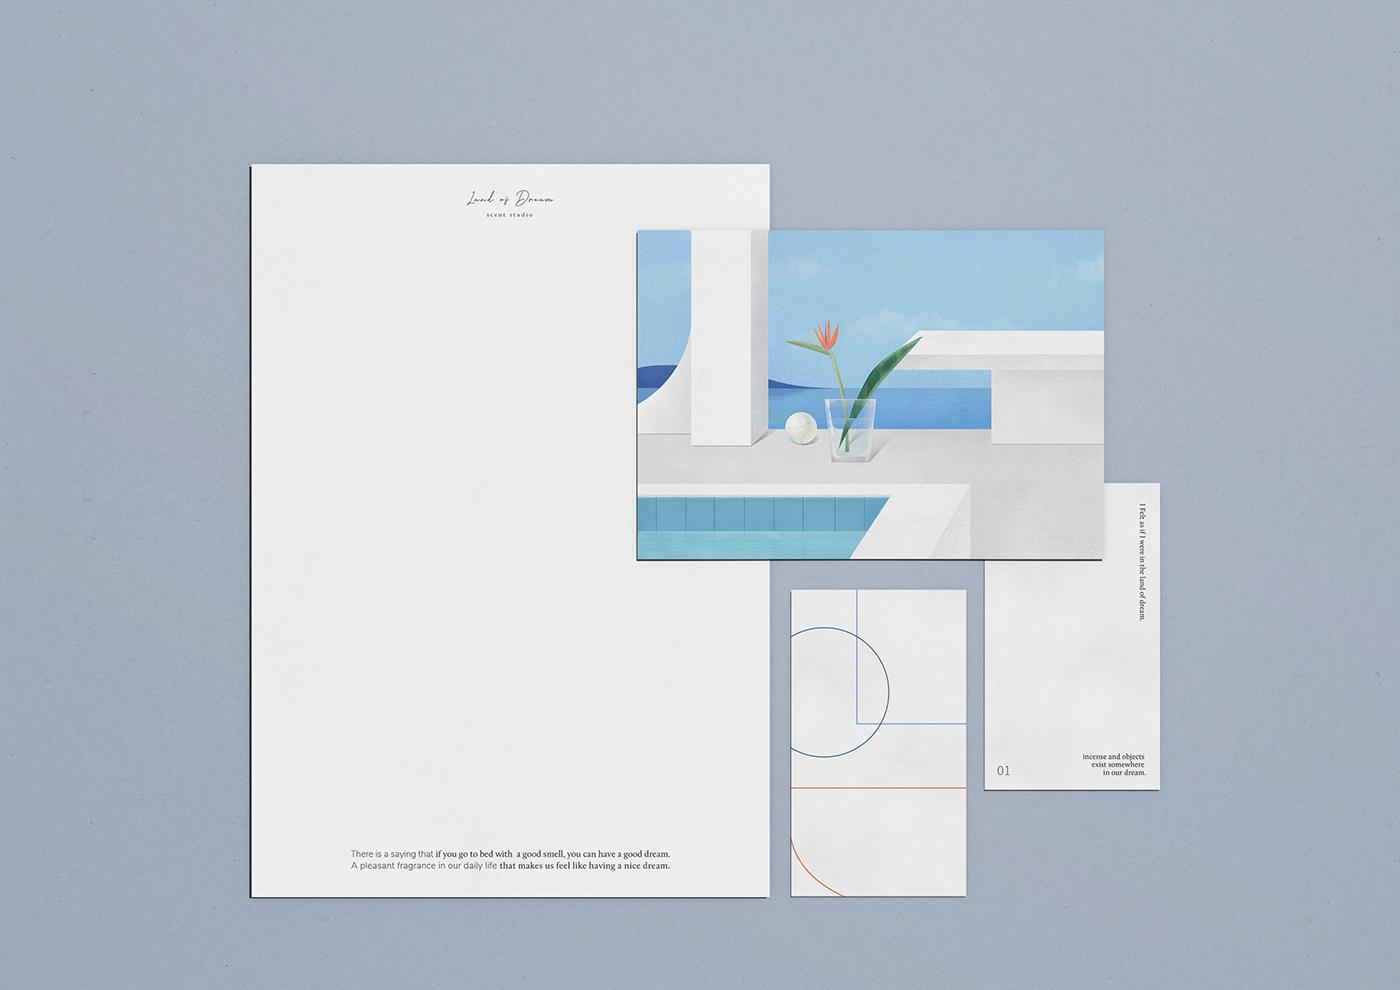 graphic design ,branding ,ILLUSTRATION ,package design ,art,color,package,design,graphic,Space